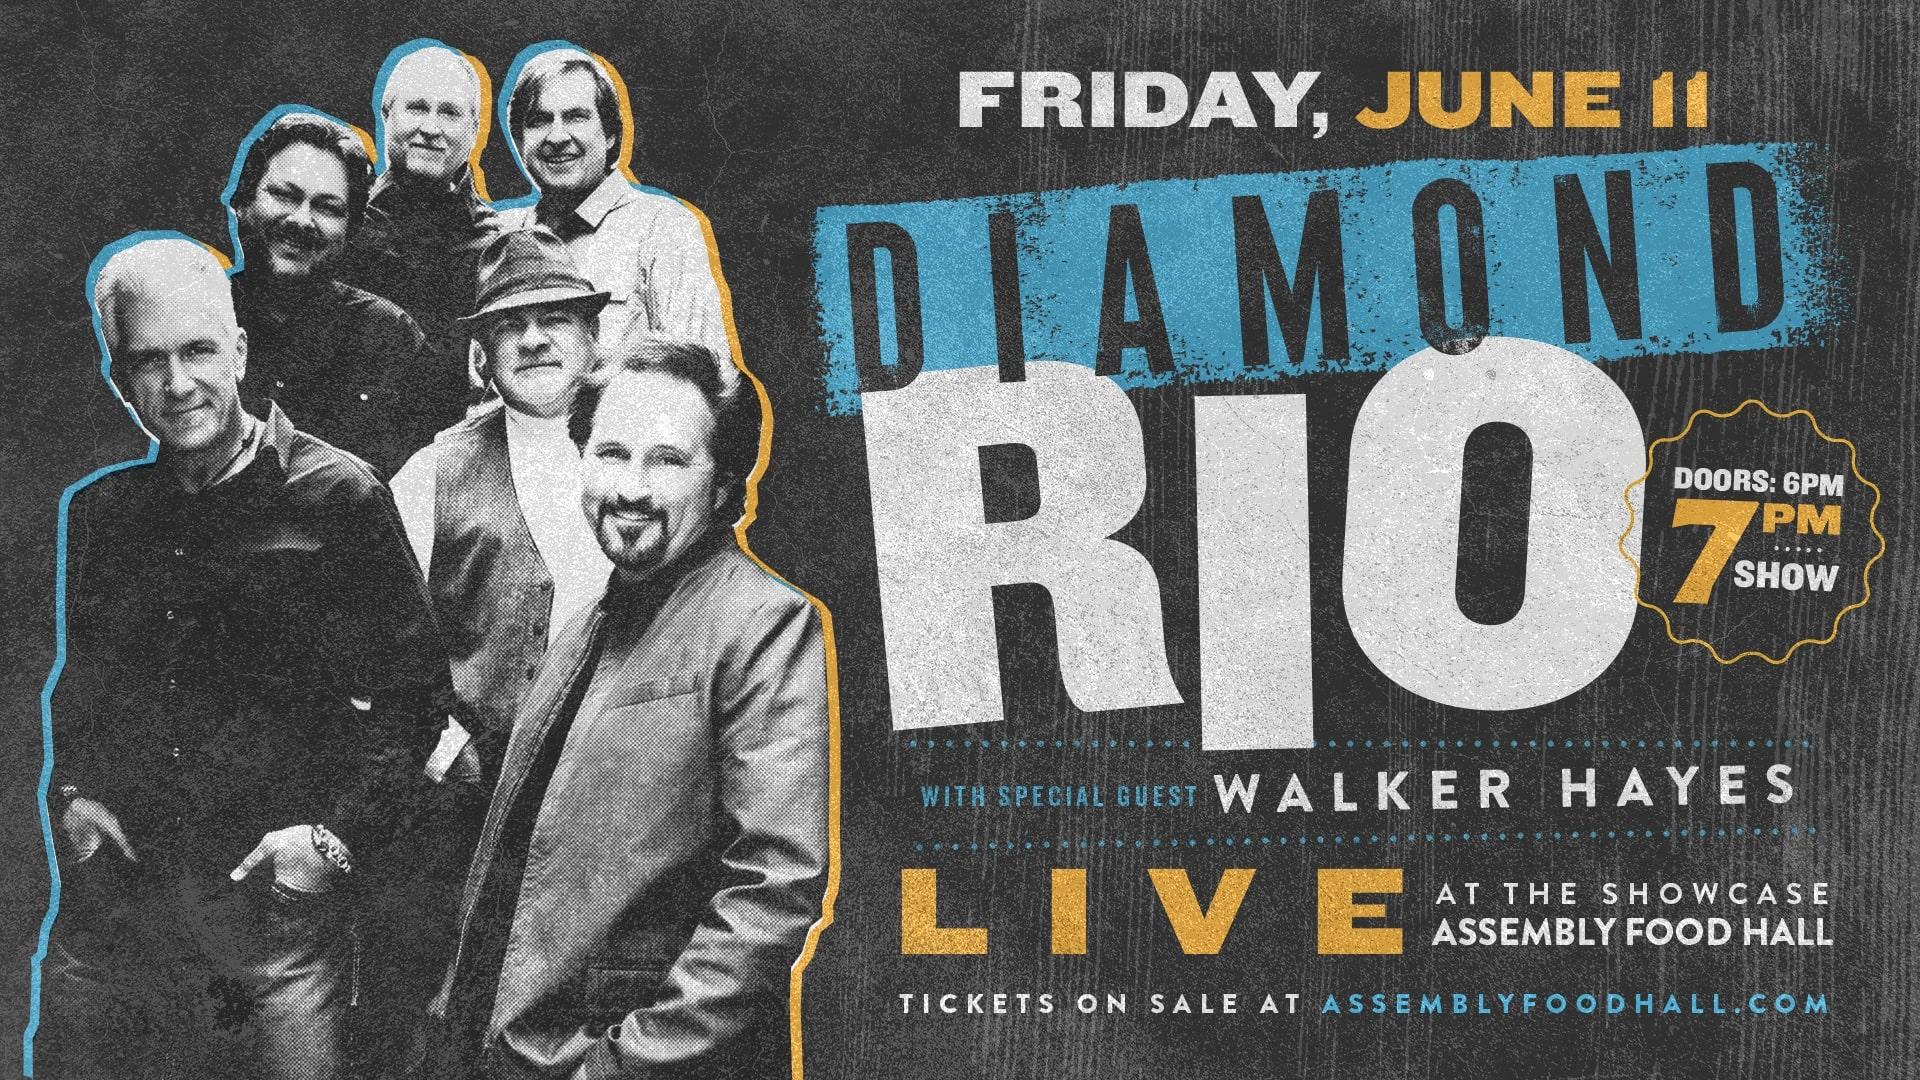 Diamond Rio Tickets On Sale